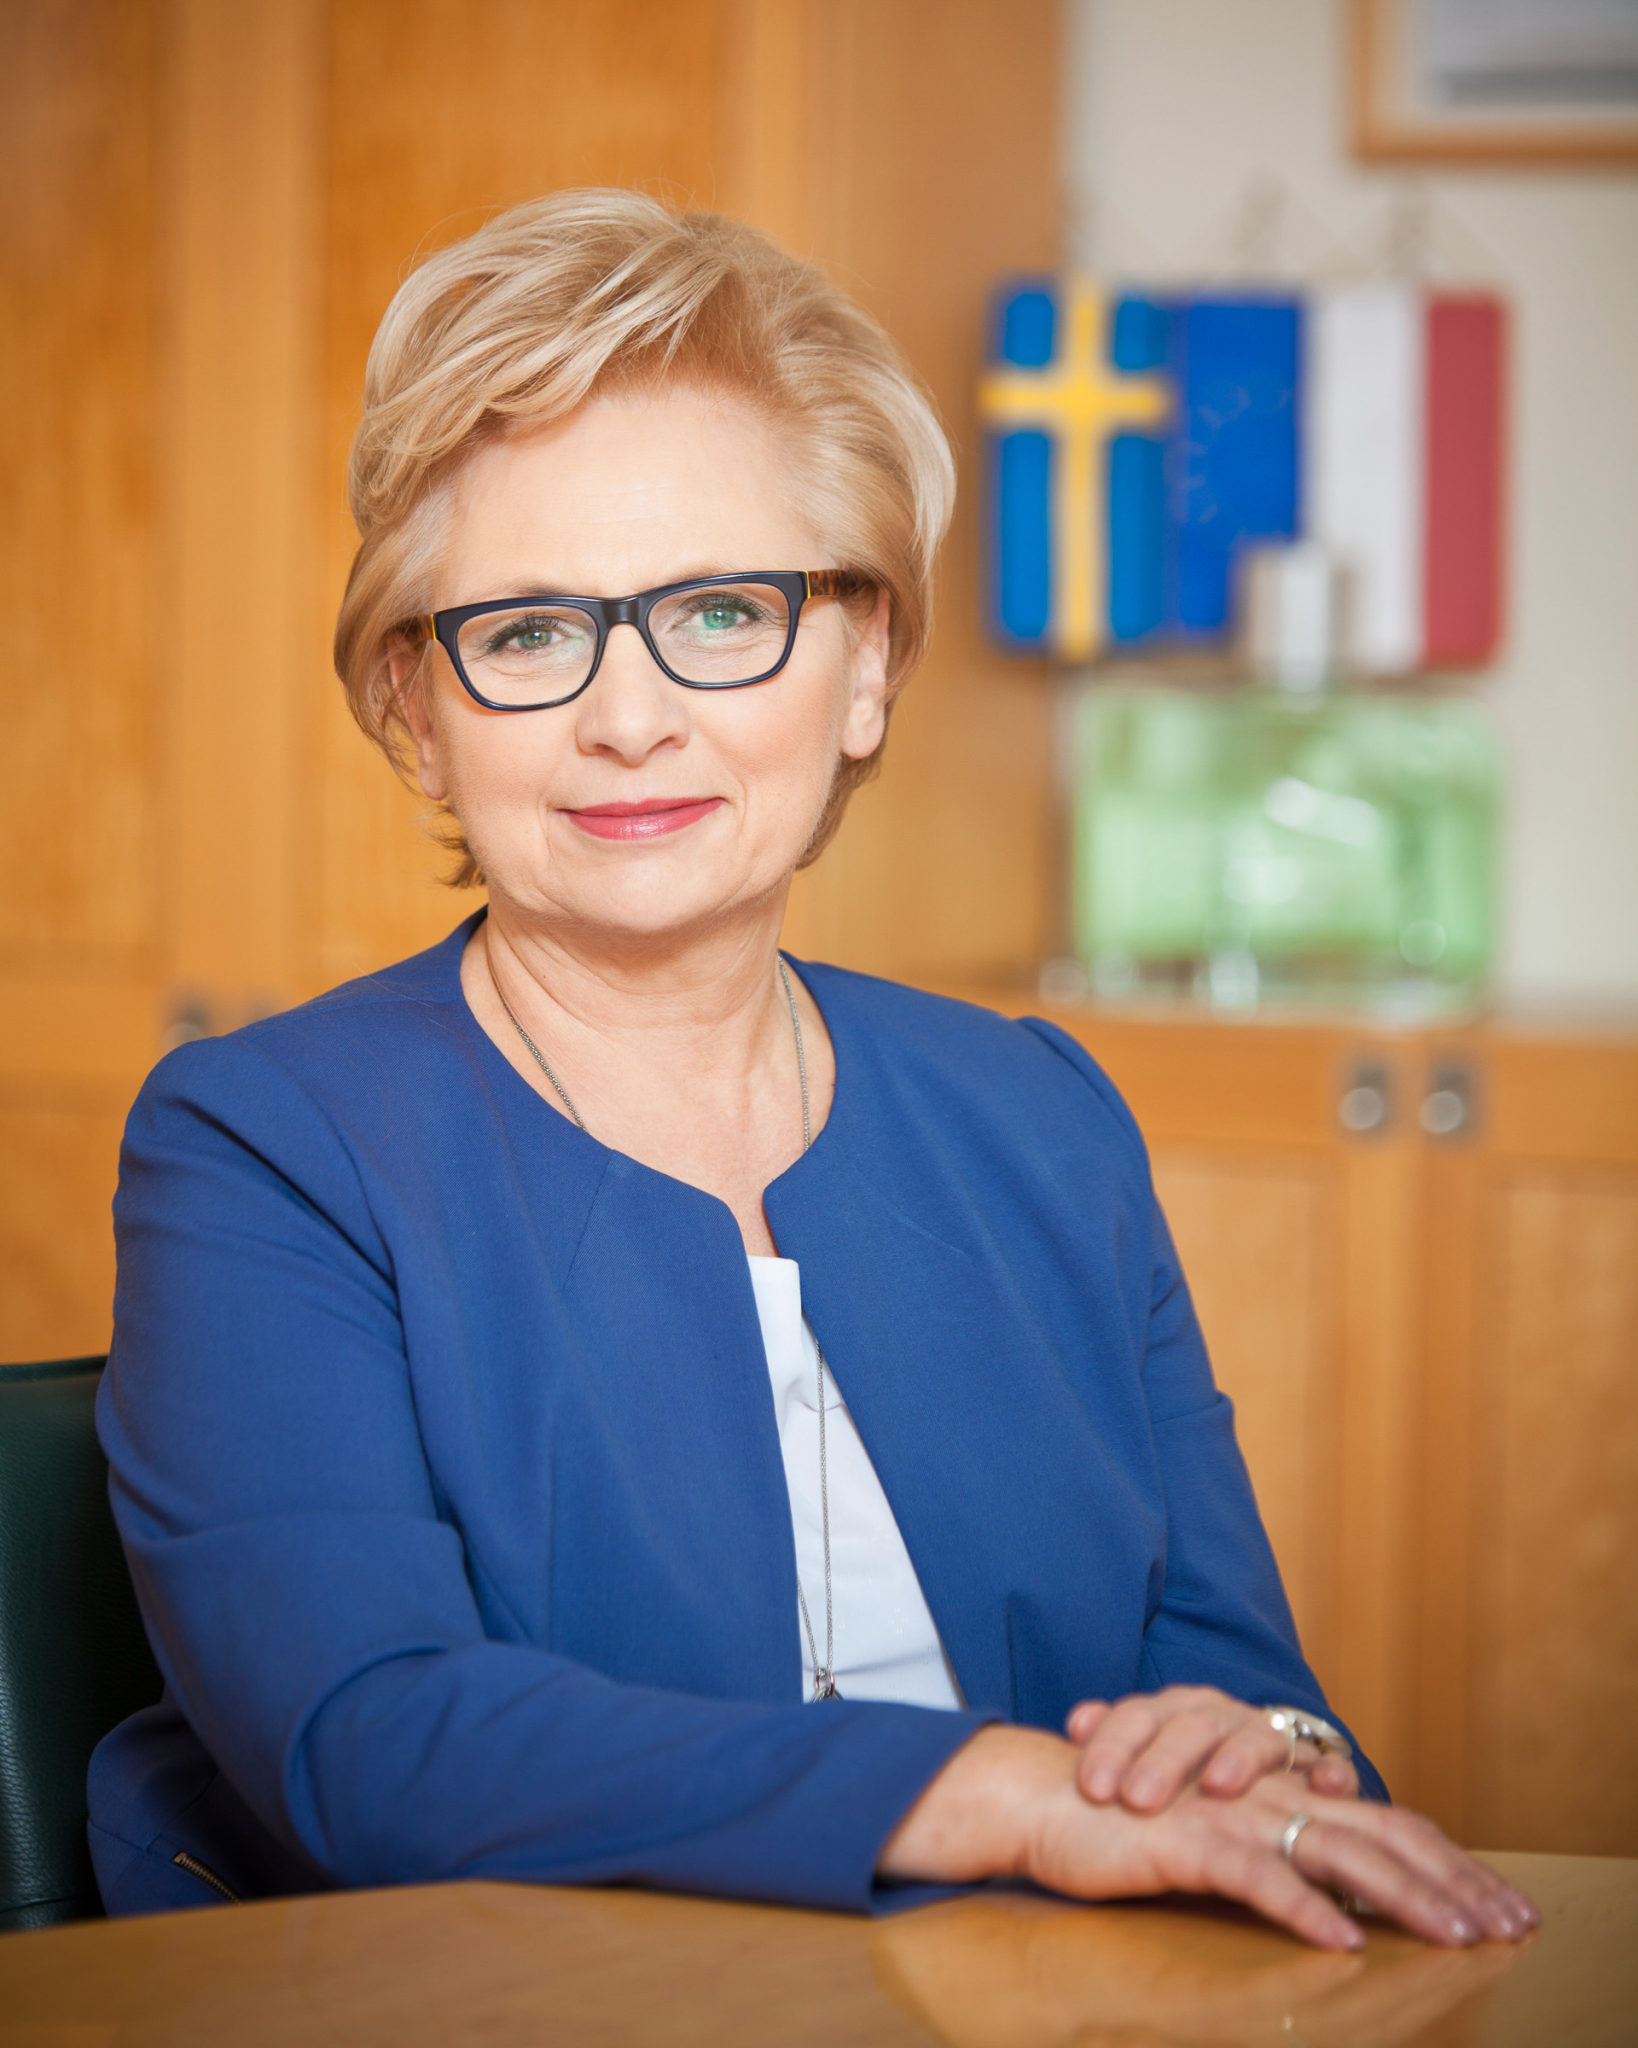 Wanda Stypułkowska